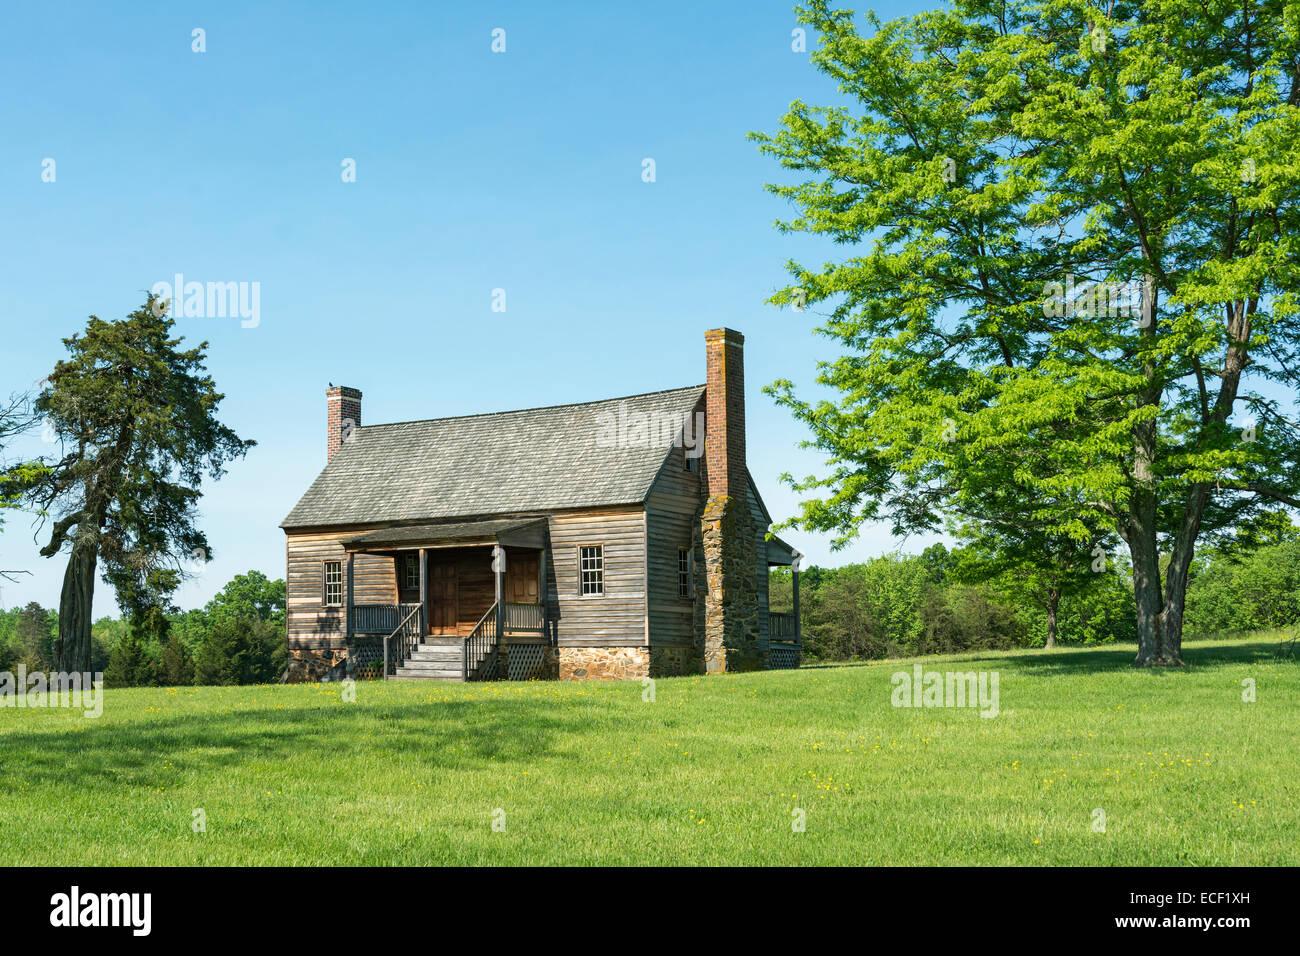 Virginia, Appomattox Court House National Historical Park, Mariah Wright House, gebaut Mitte der 1820er Jahre Stockbild